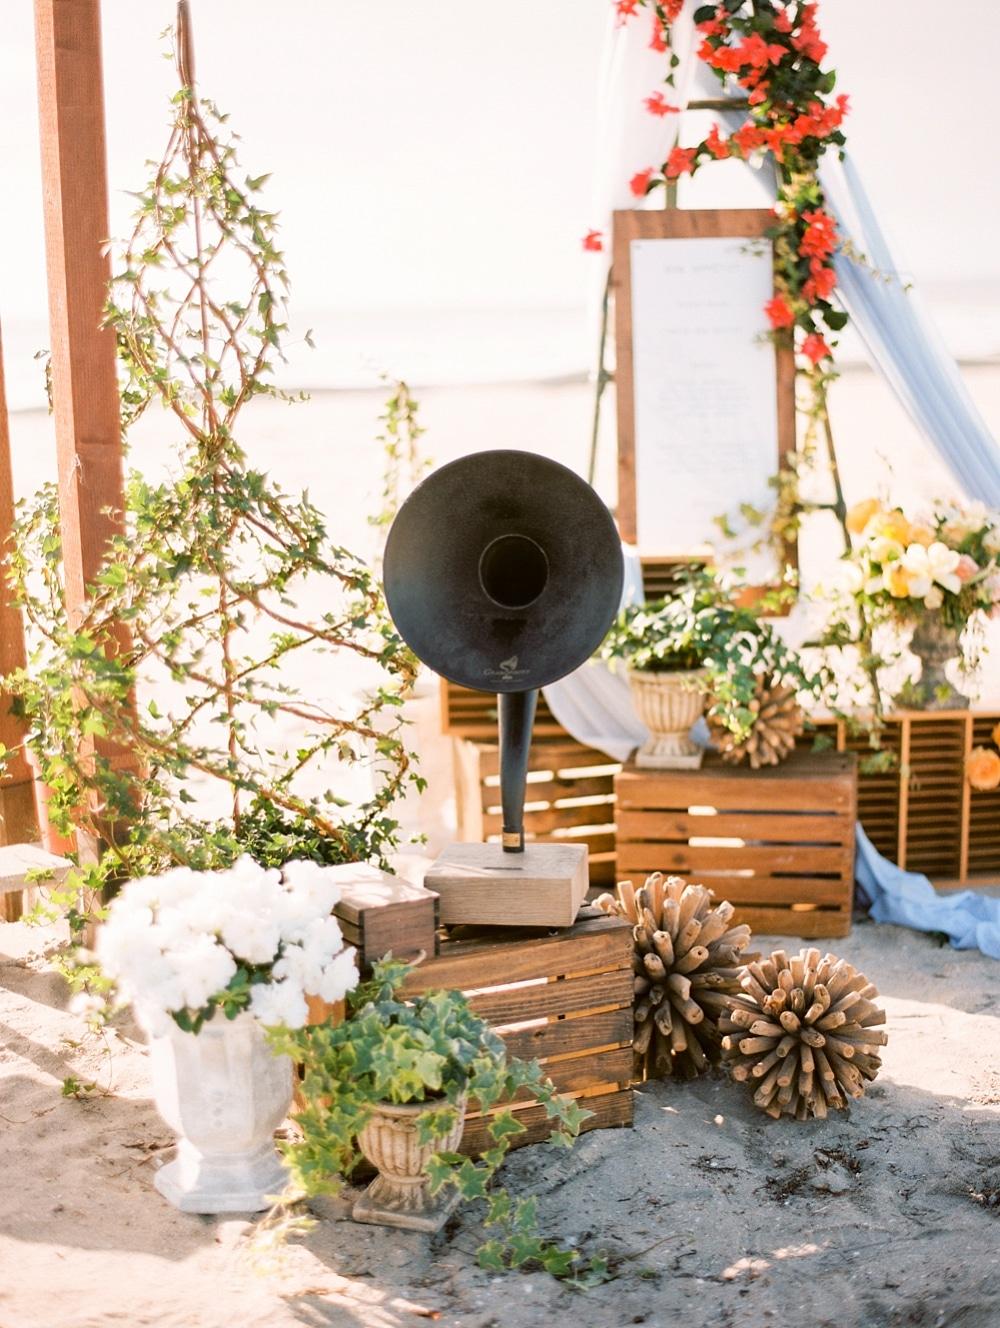 Kristin-La-Voie-Photography-San-Diego-Wedding-Photographer-6